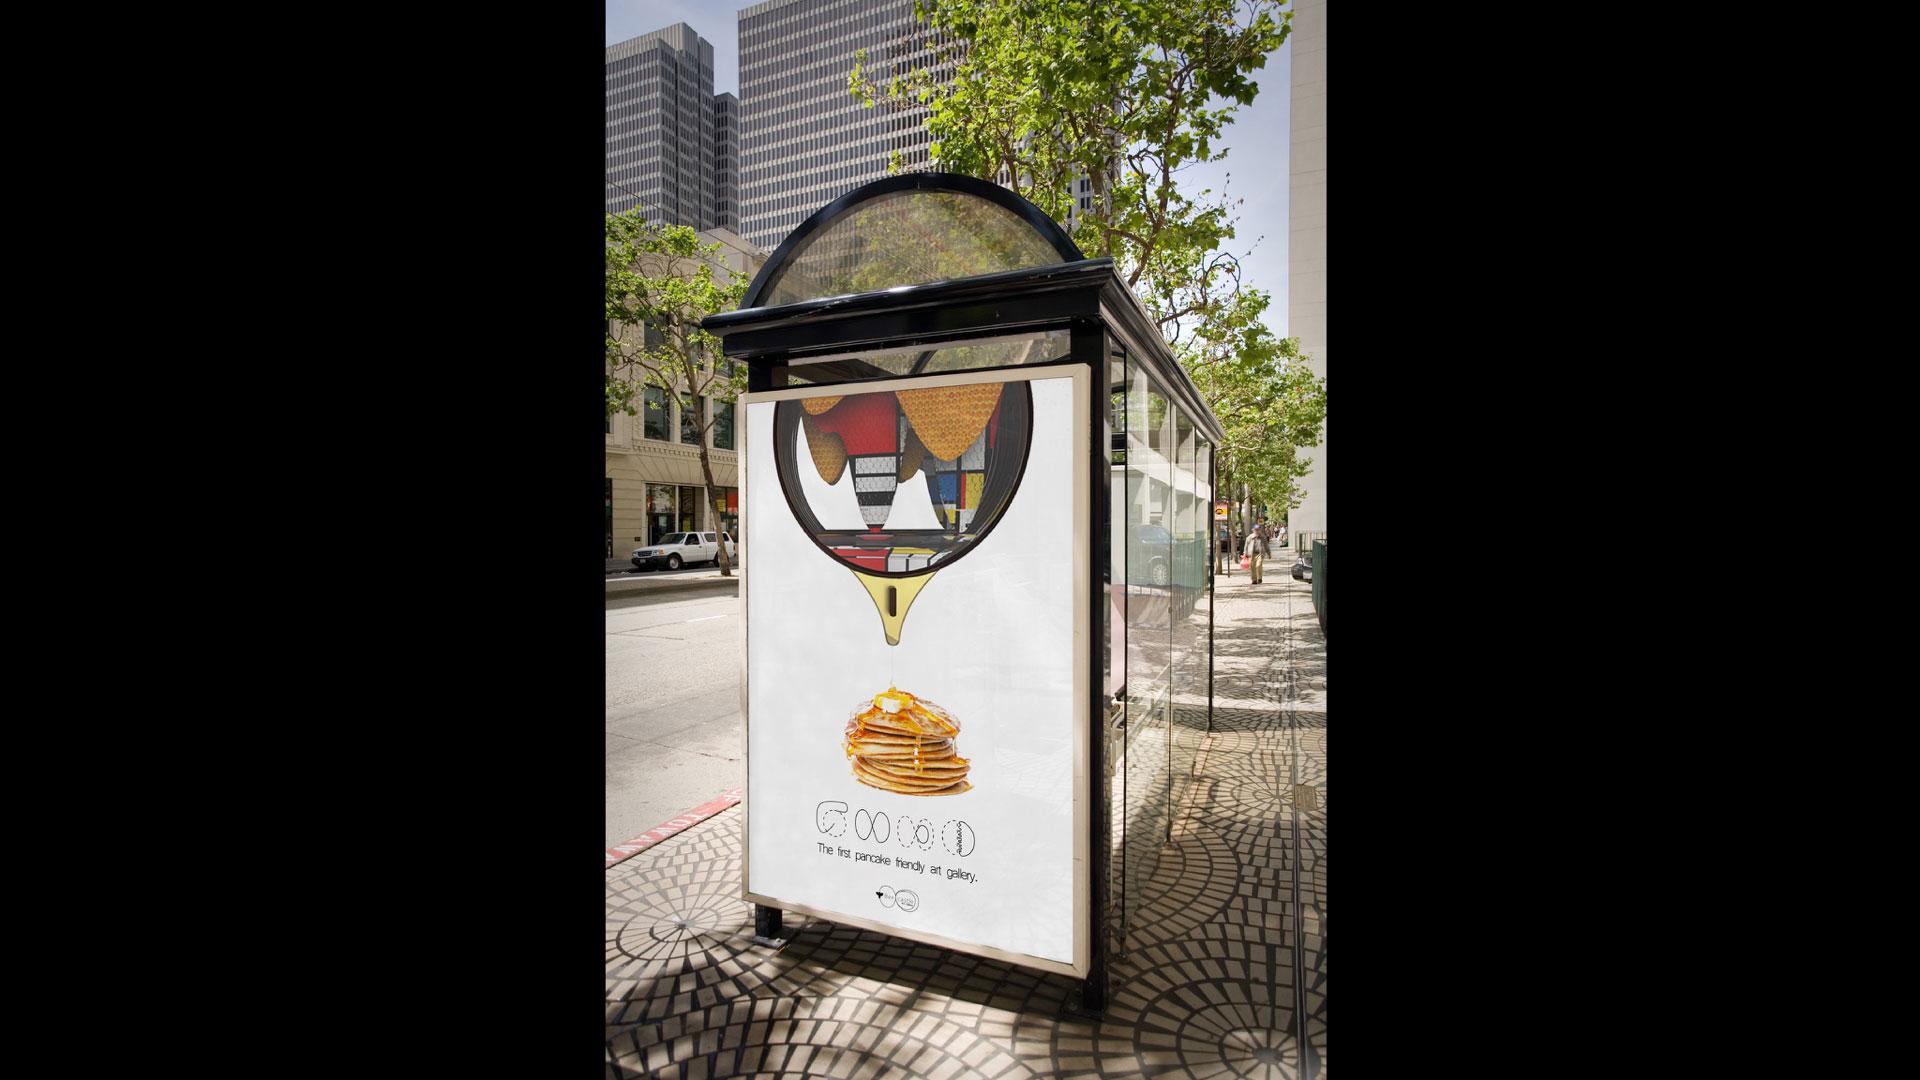 Xu_Beecastle-campaign.jpg